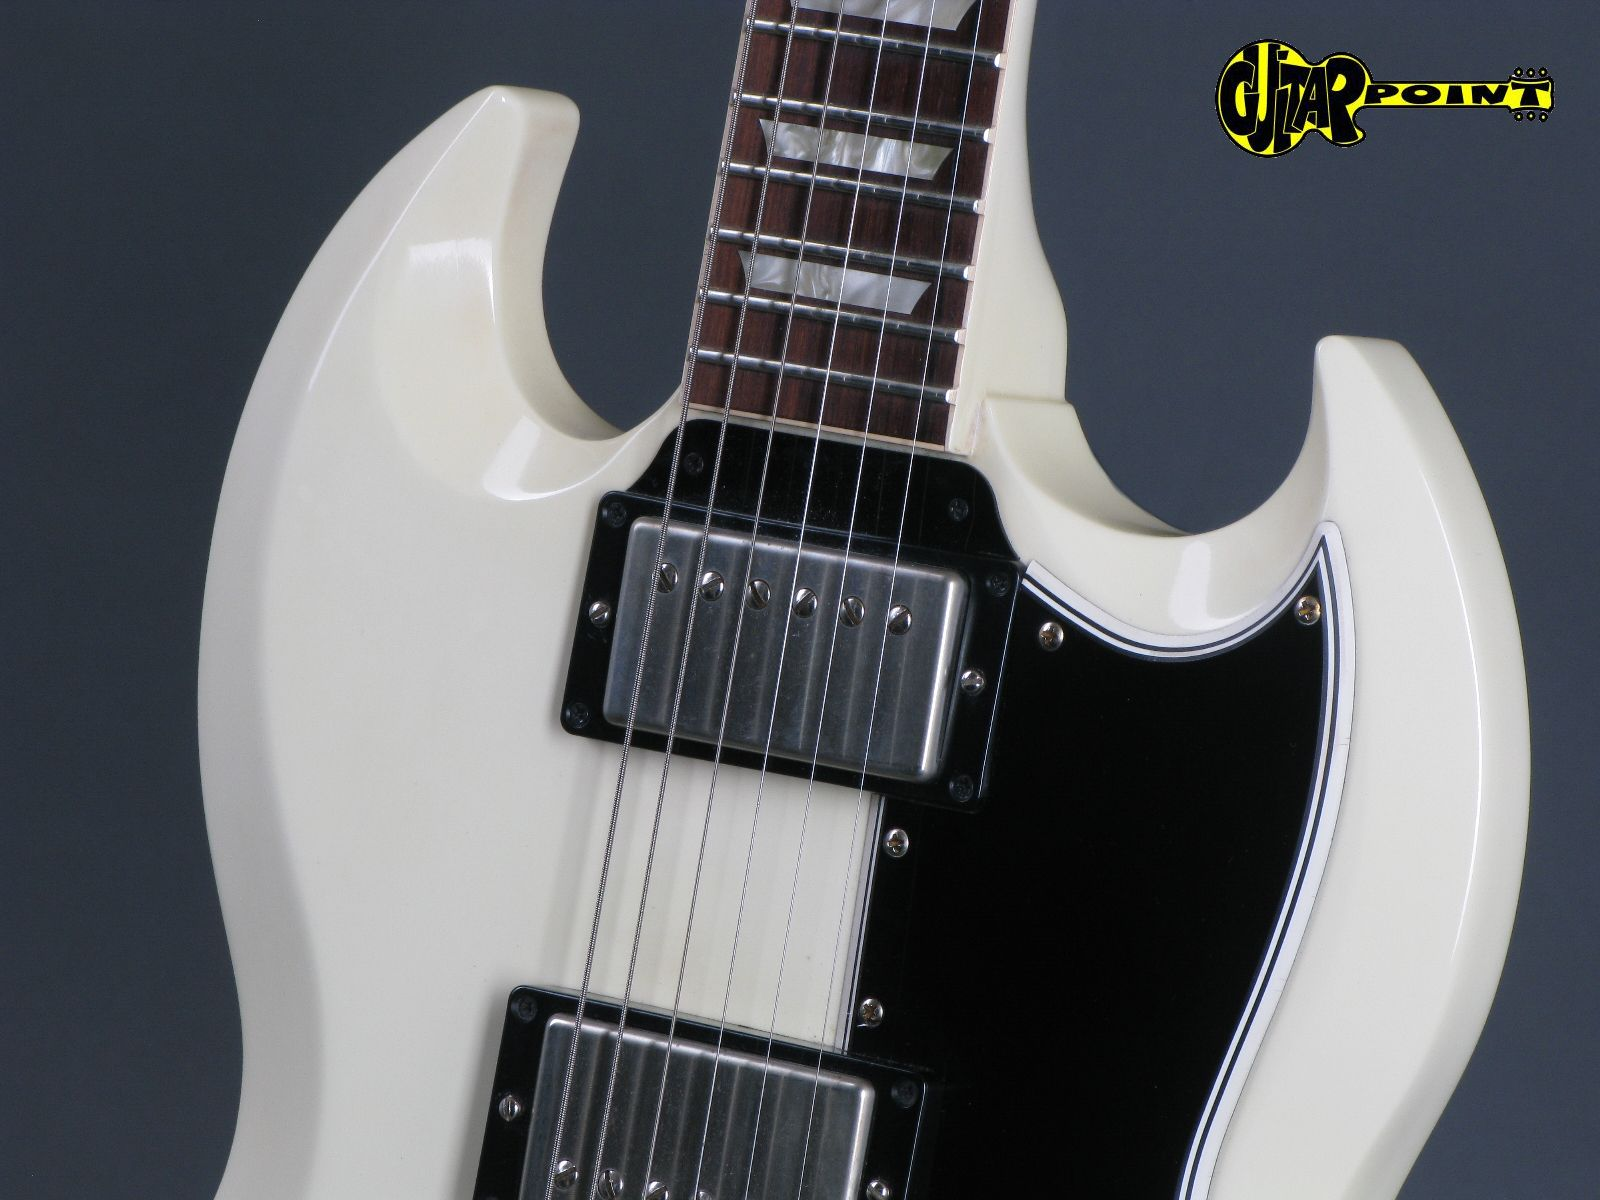 gibson historic custom shop sg standard vos 2007 classic white guitar for sale guitarpoint. Black Bedroom Furniture Sets. Home Design Ideas